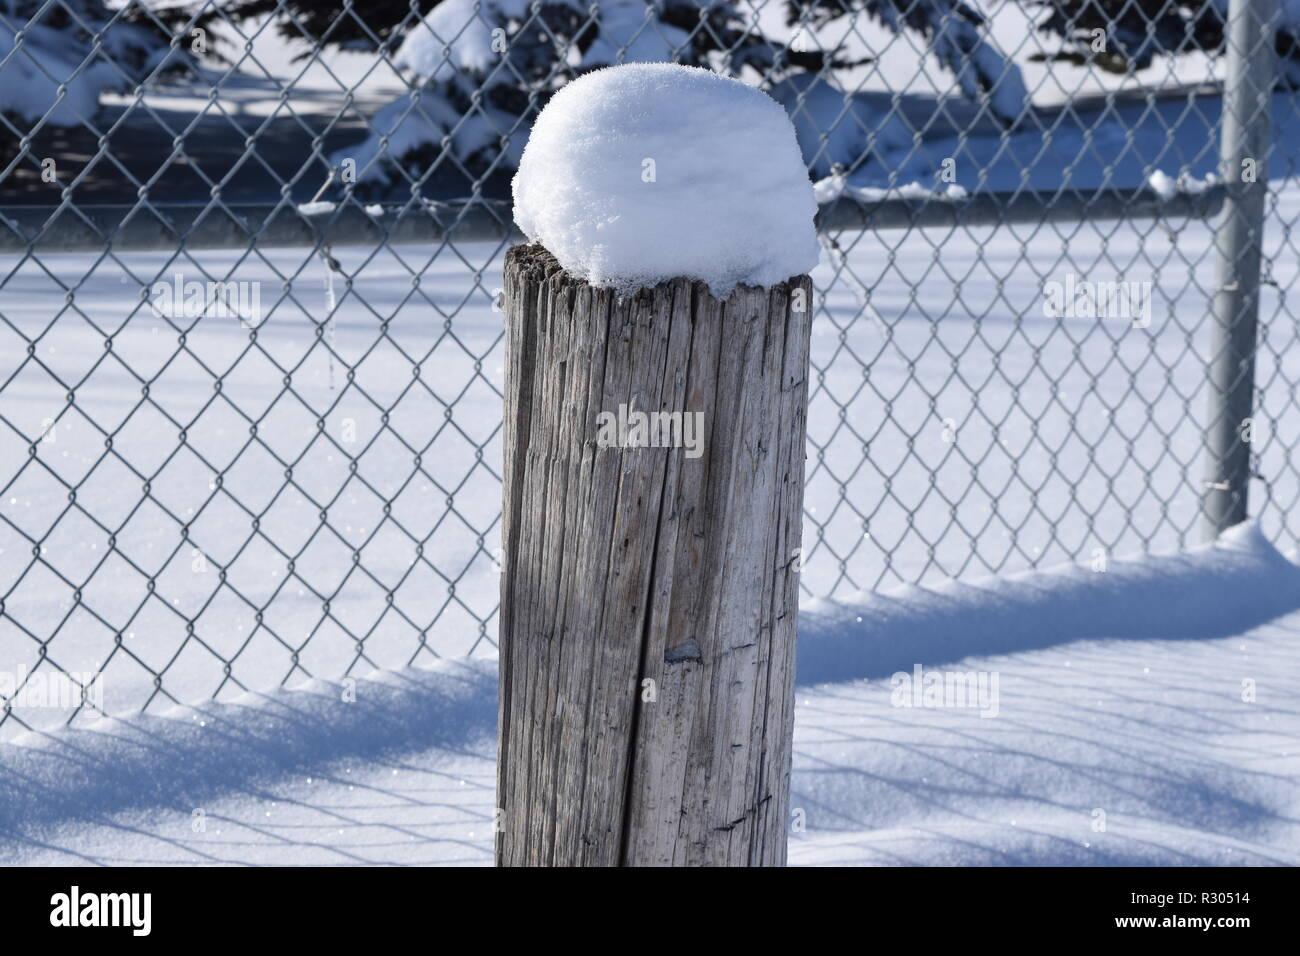 fresh winter Snowfall - Stock Image